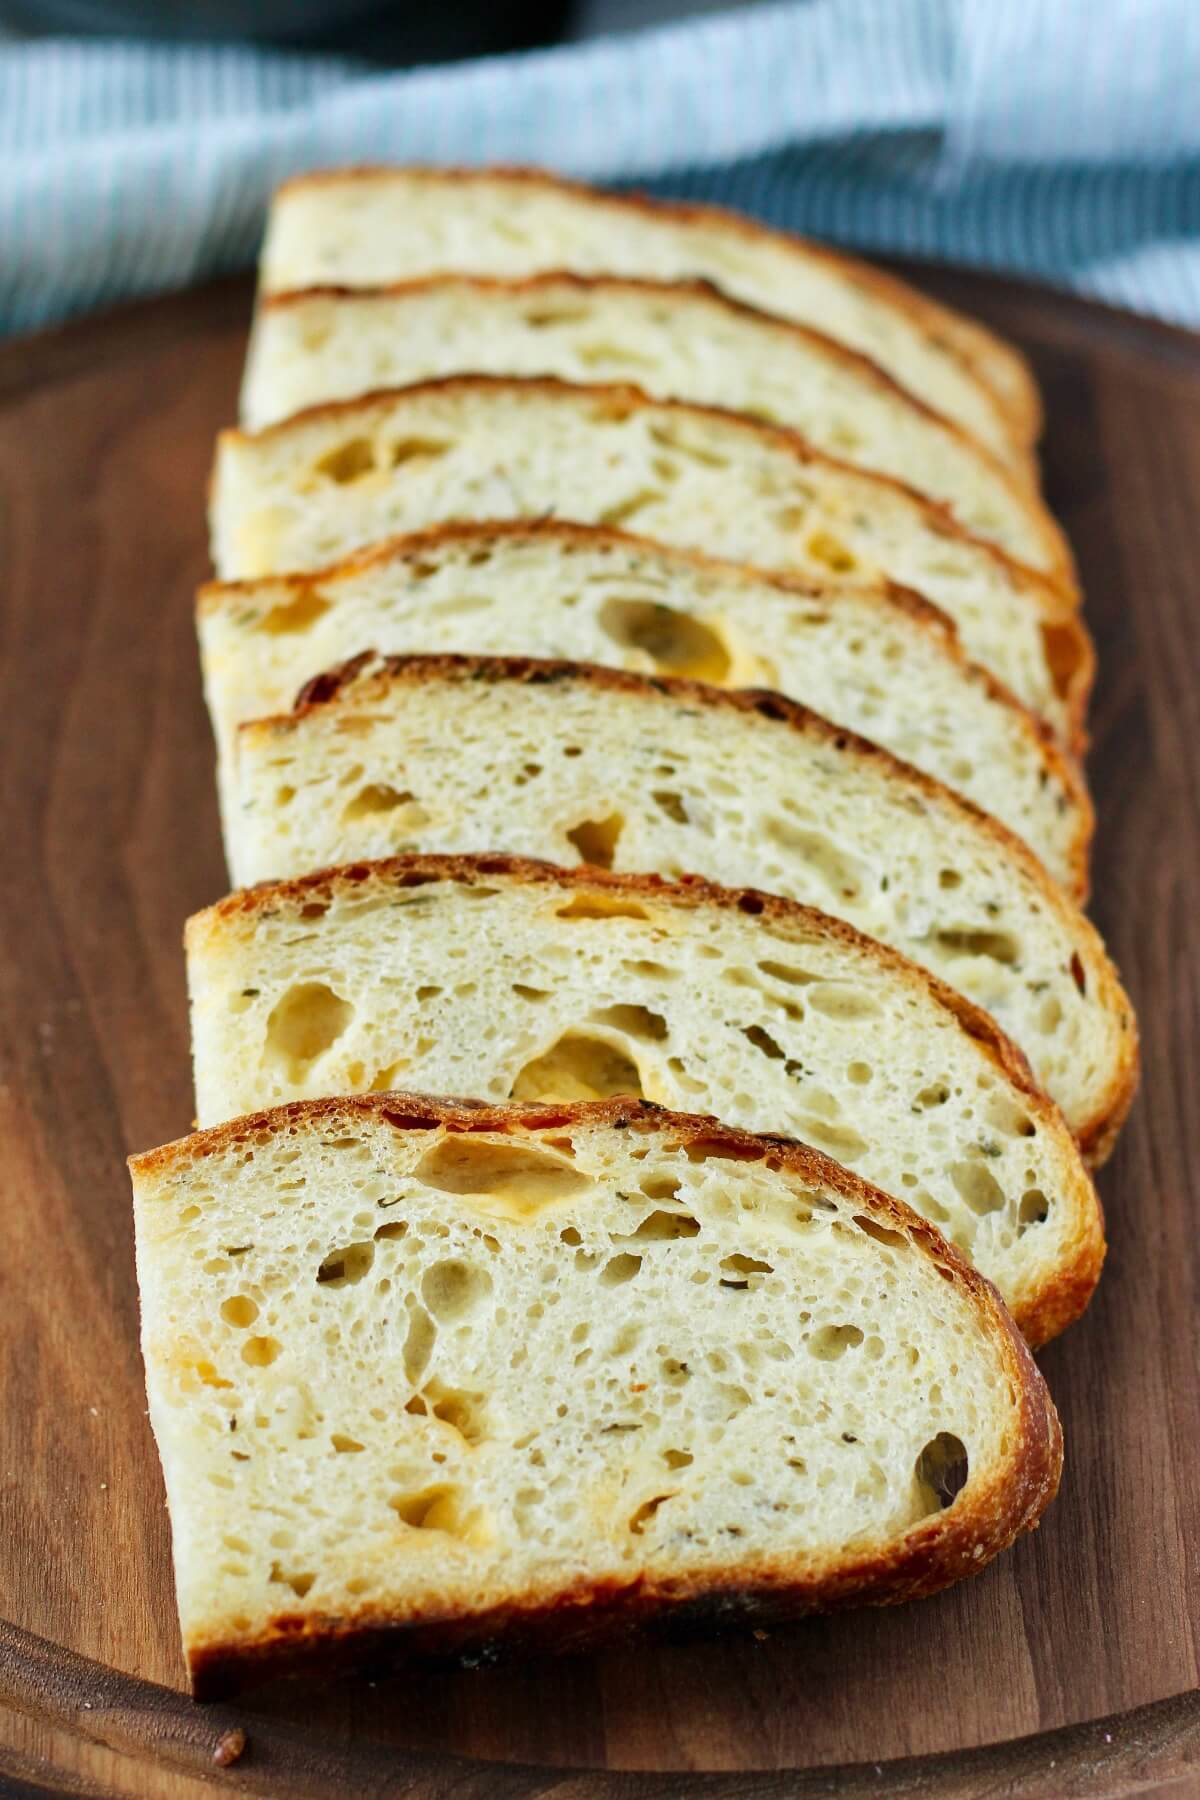 Cheddar Chive Sourdough Bread slices